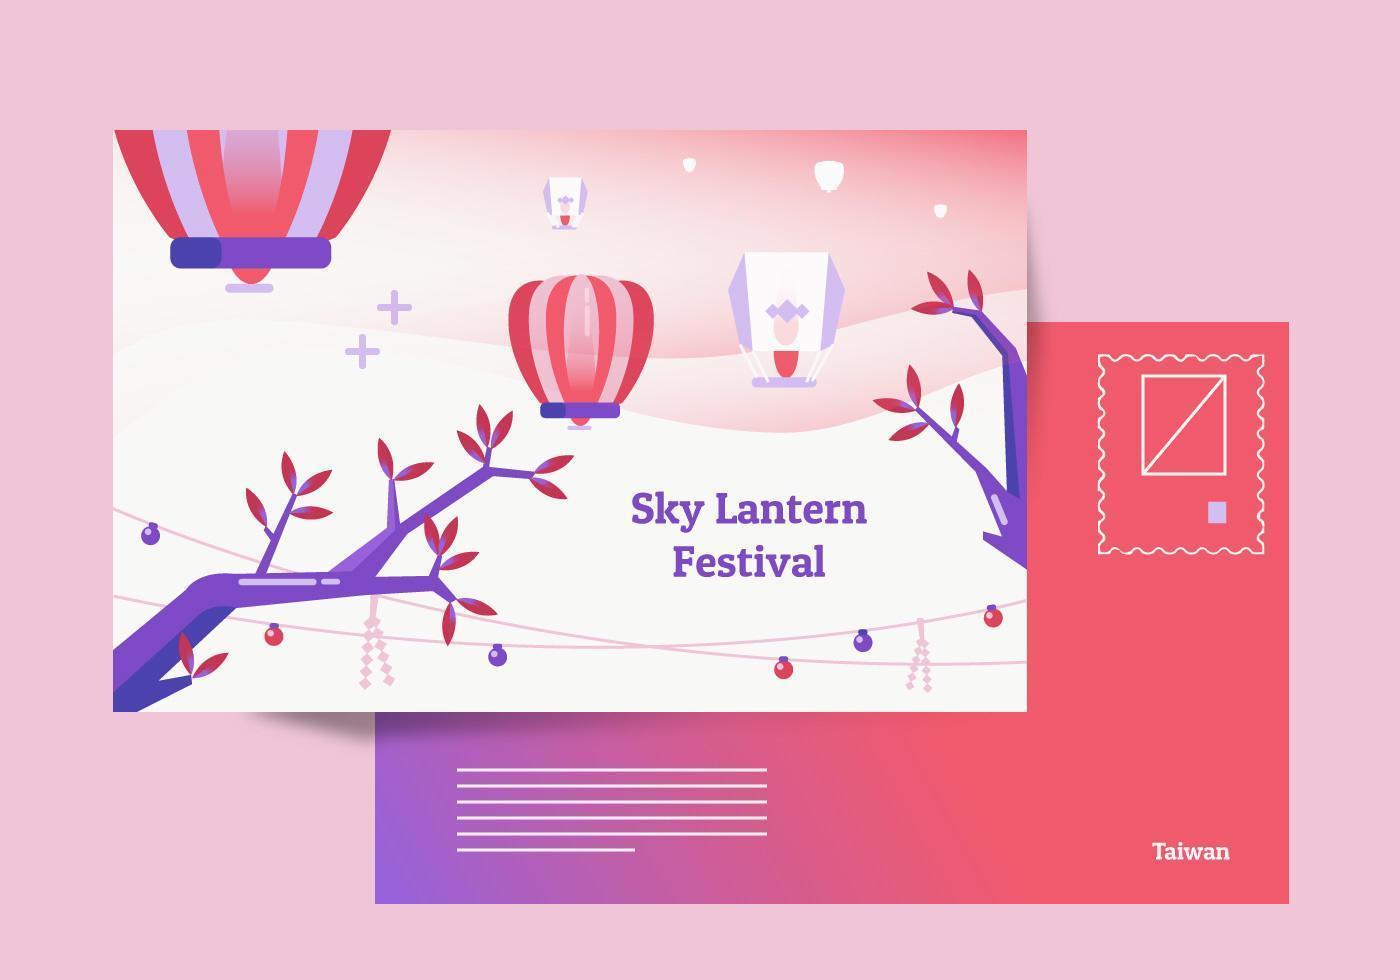 Taiwan Sky Lantern Postcard Background Vector Illustration